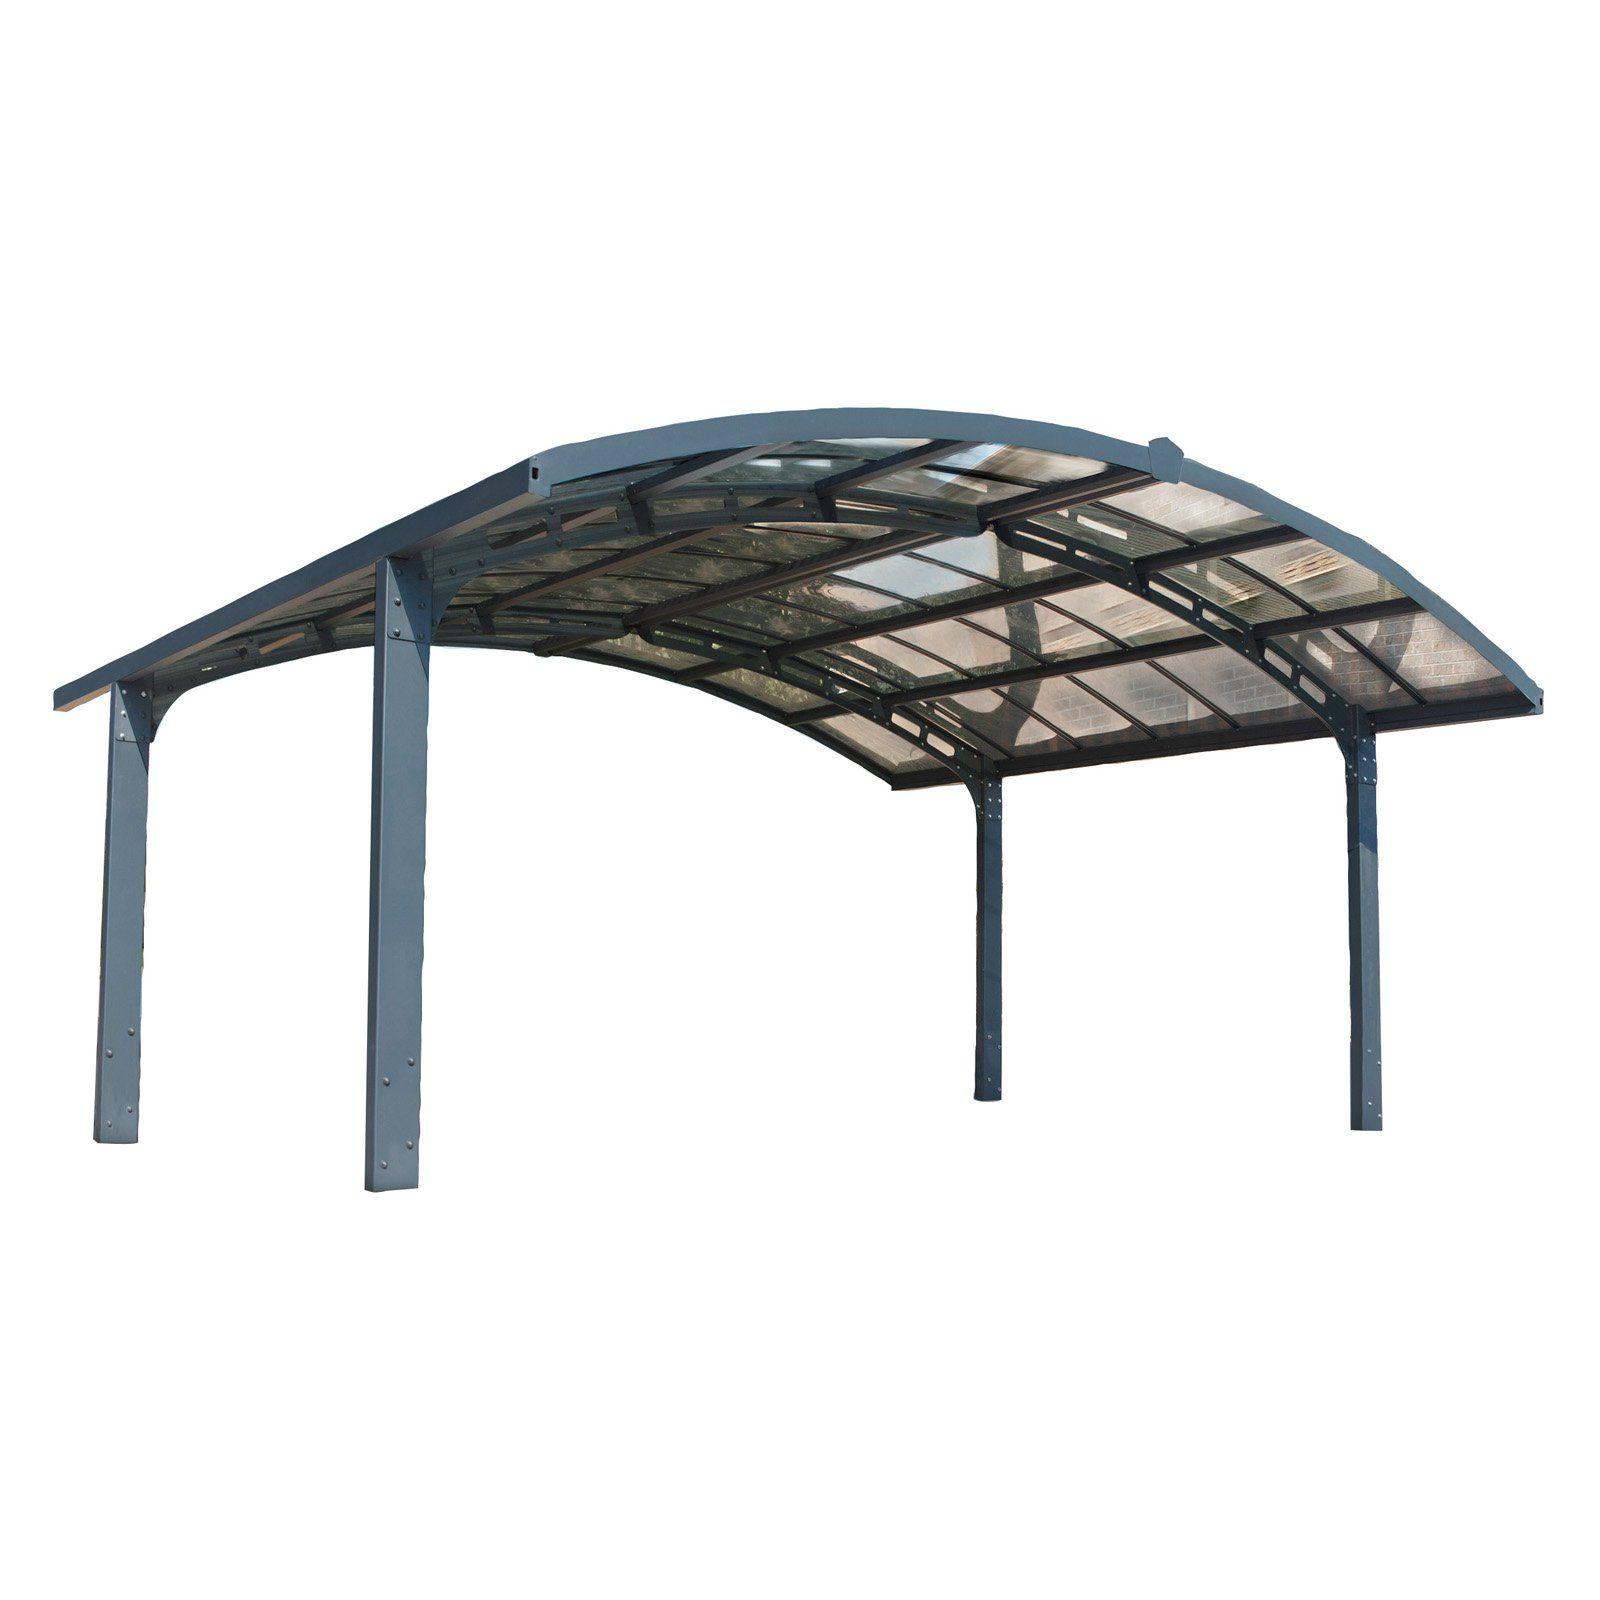 Palram Arizona Breeze 19 X 16 Ft Arch Style Double Carport Double Carport Polycarbonate Roof Panels Carport